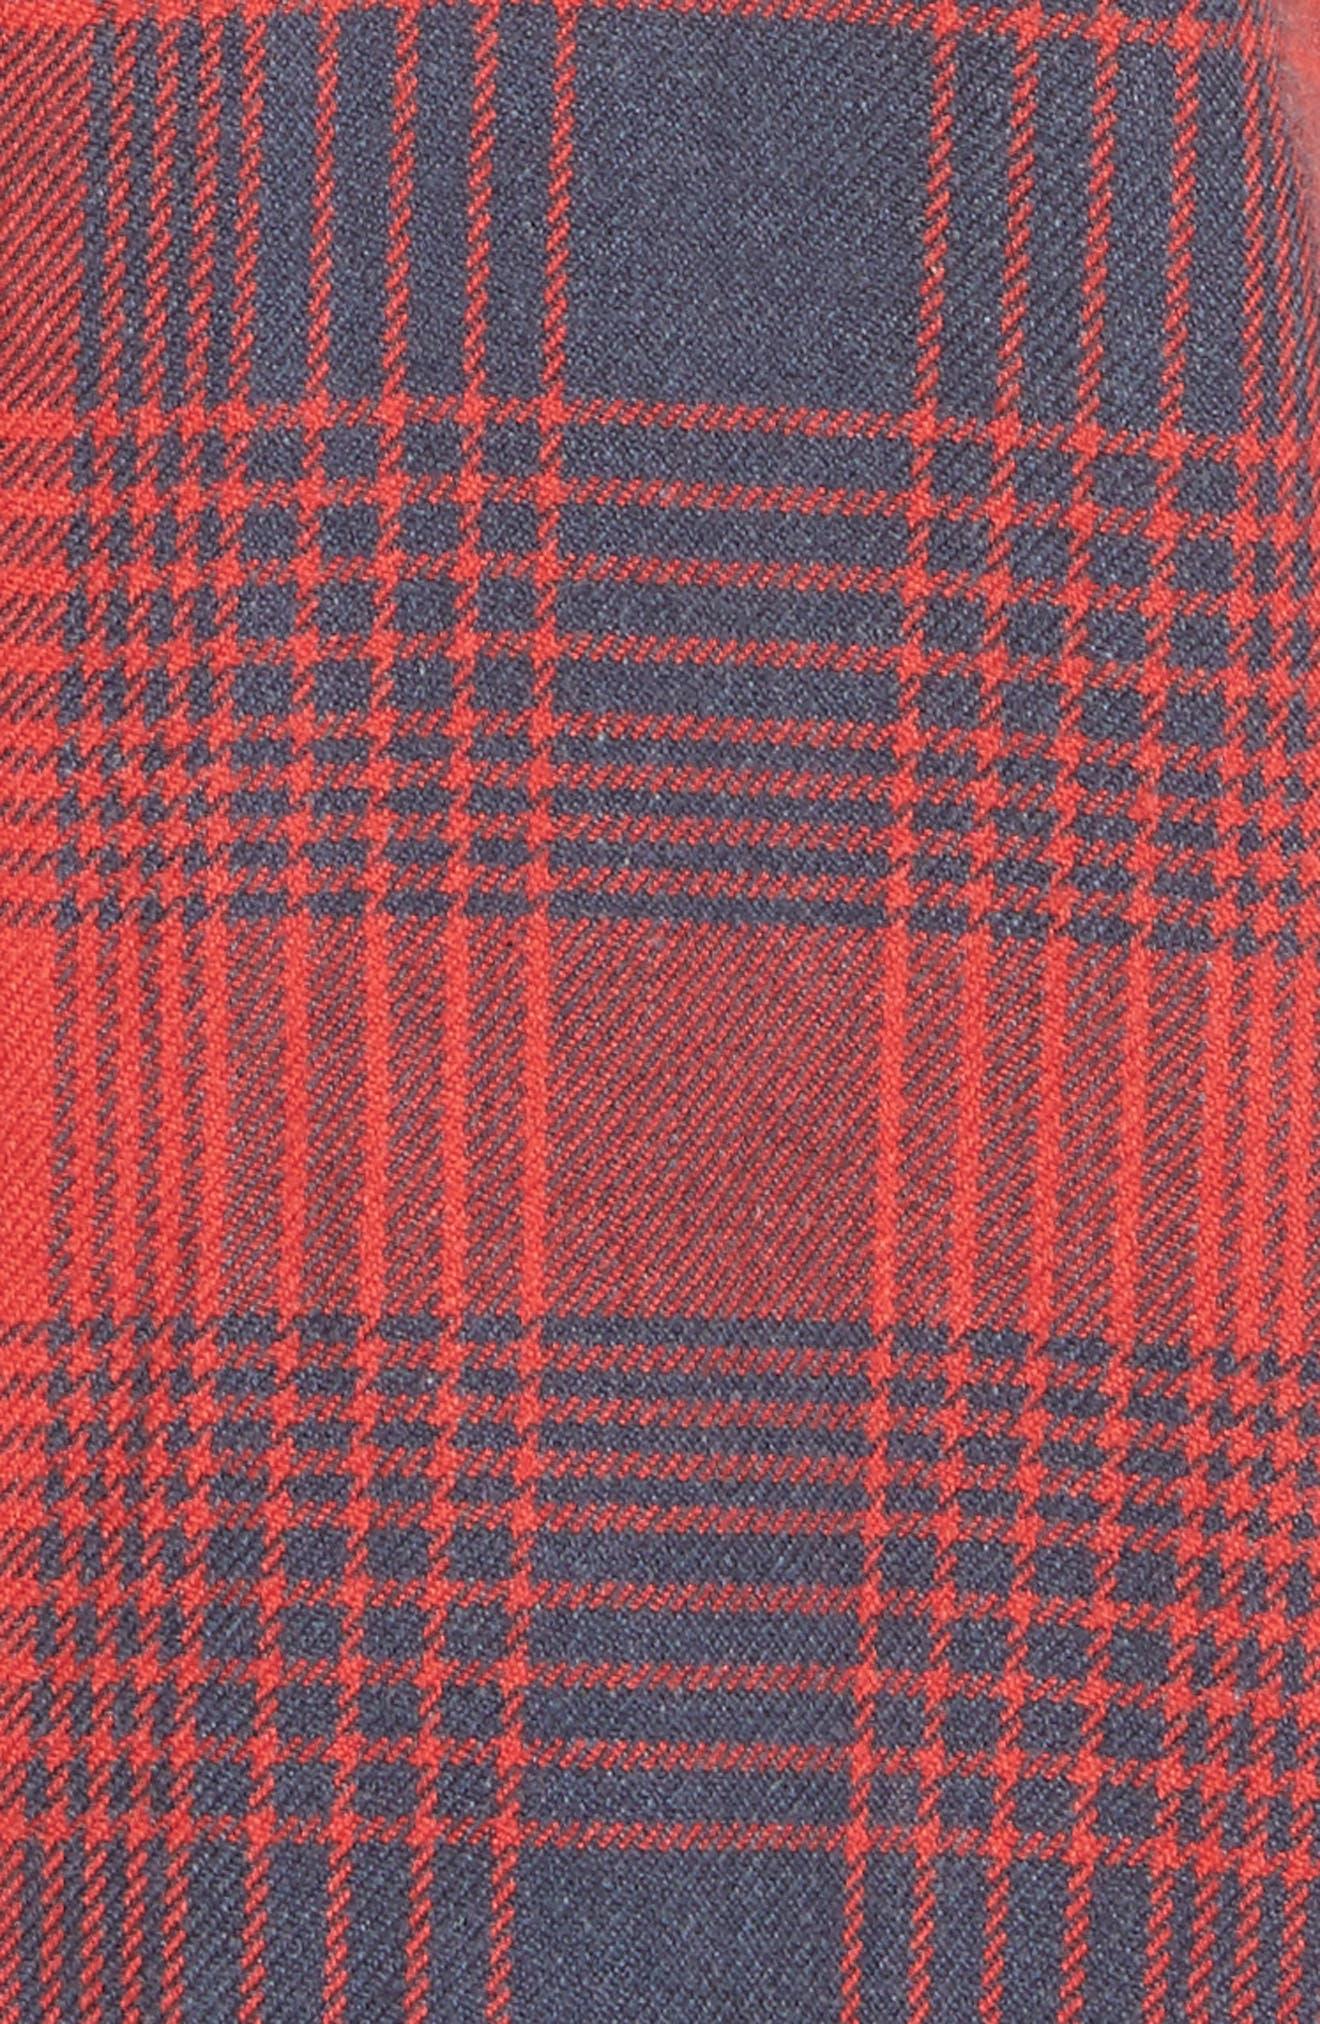 Plaid Woven Shirt,                             Alternate thumbnail 5, color,                             620